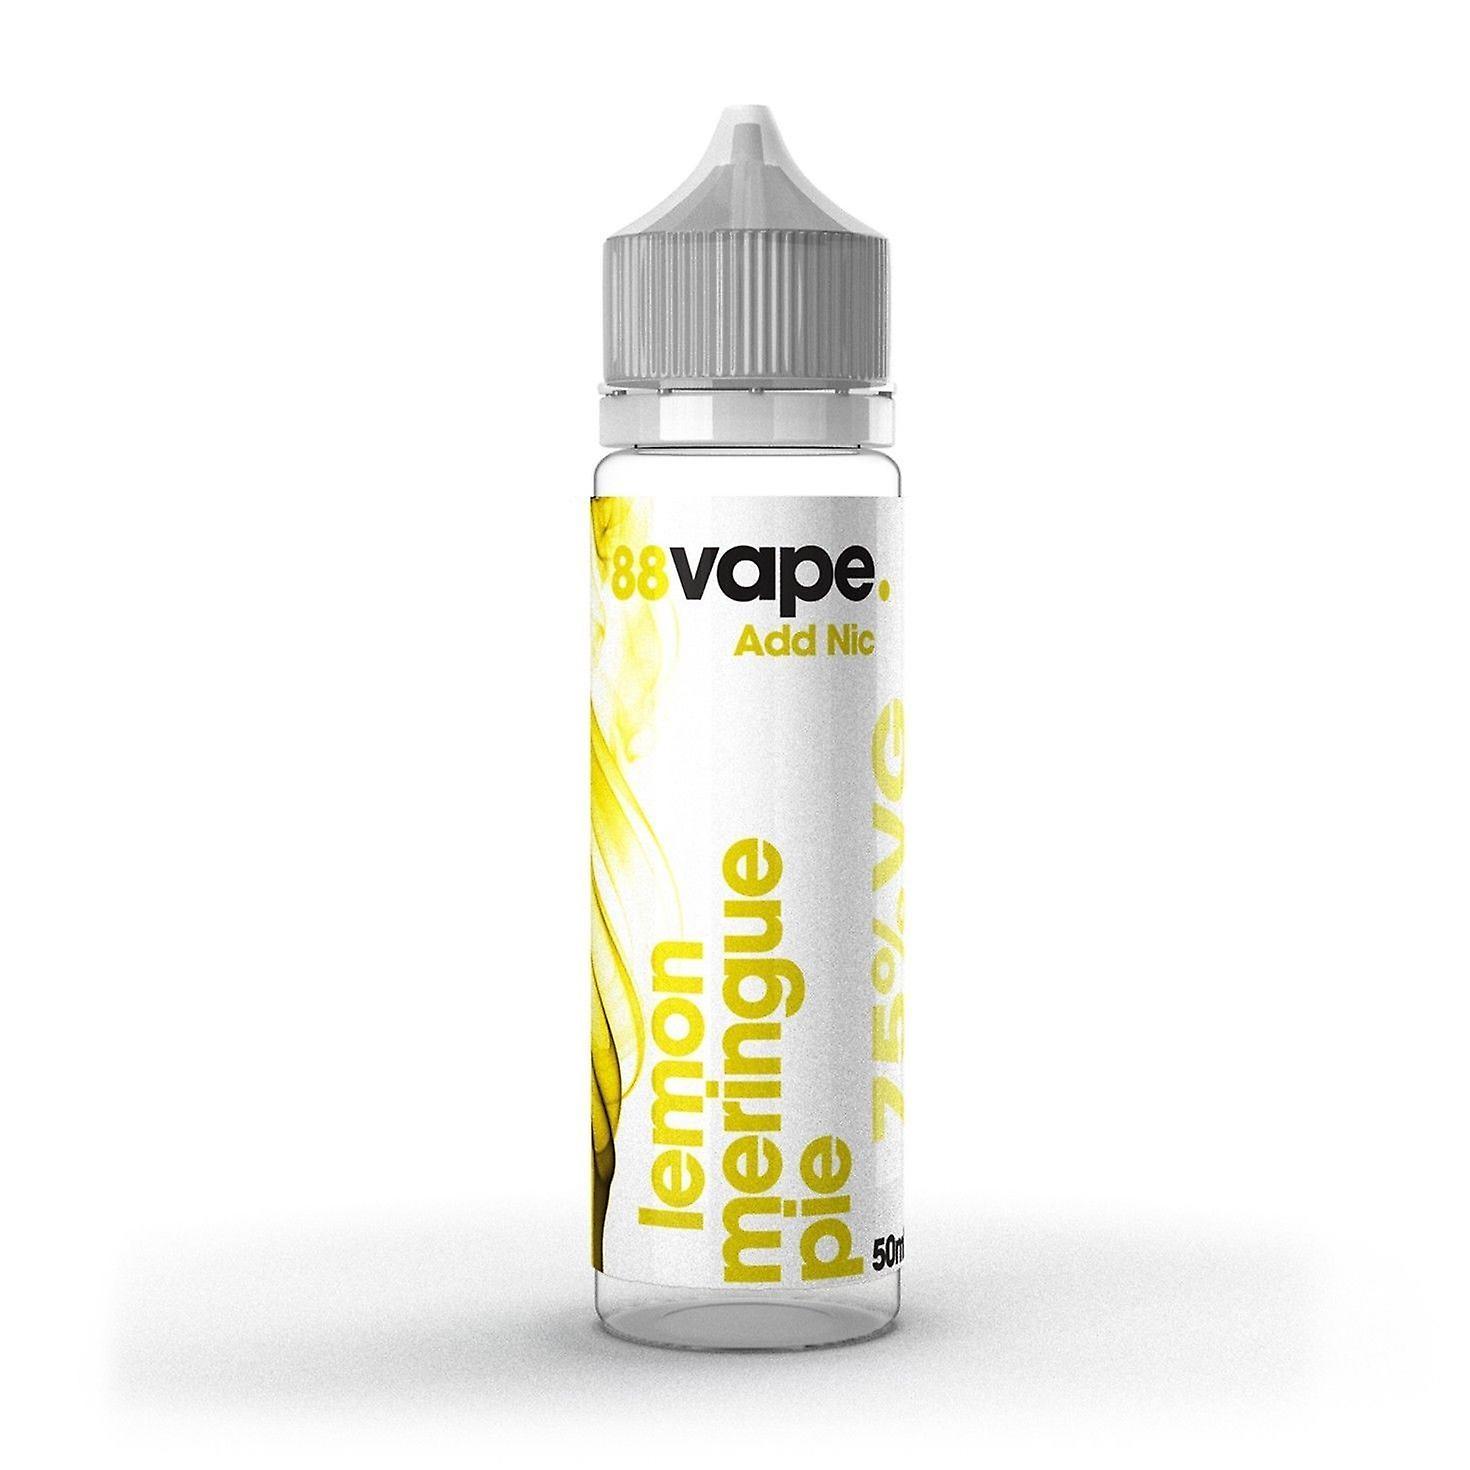 88 Vape Shortfill E-Liquid Lemon Meringue Pie NULL Nikotin 50ML von 0mg 60-ML-Flasche